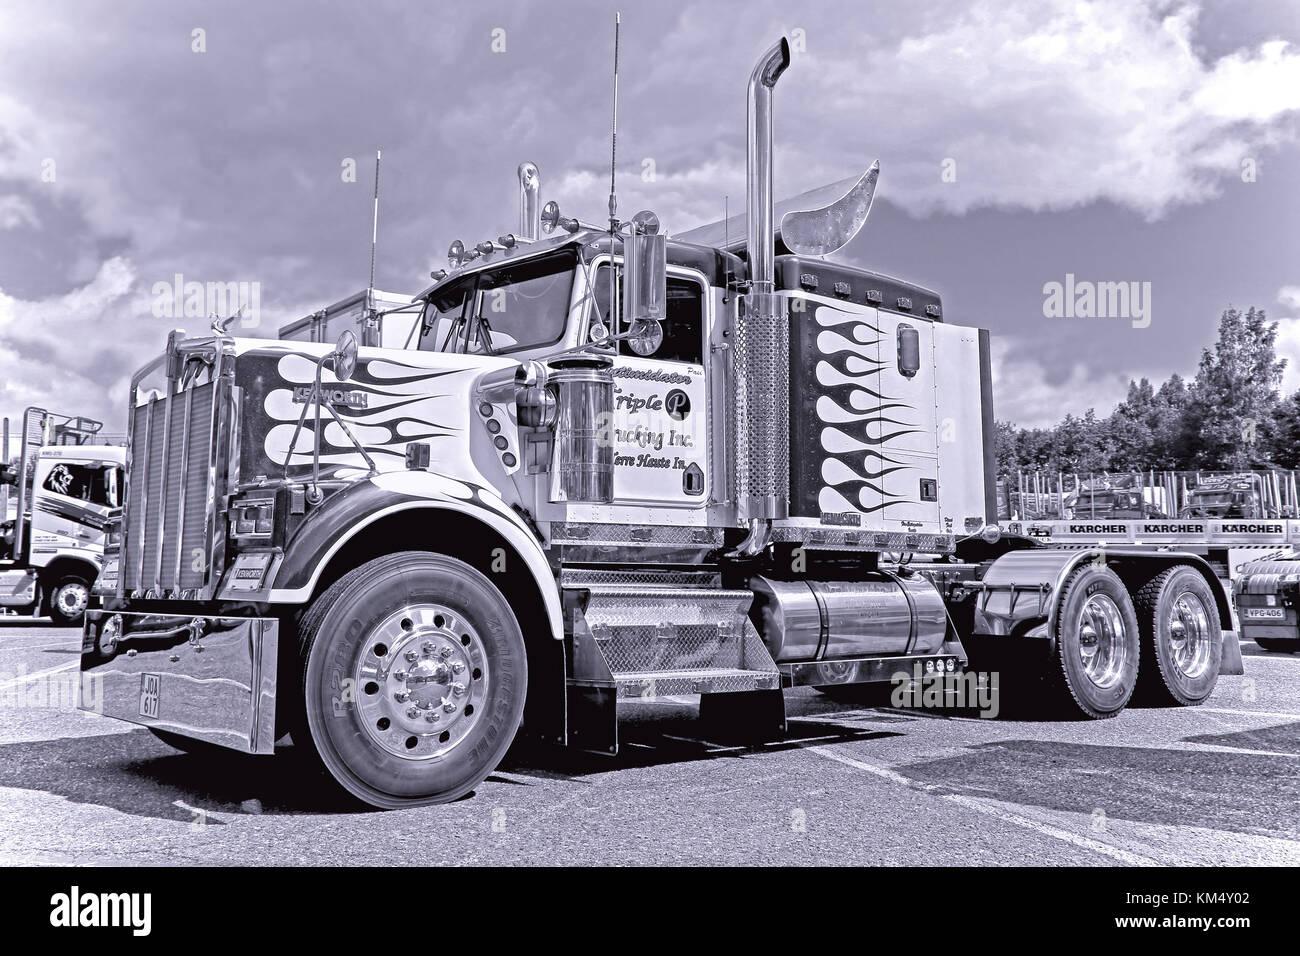 HAMEENLINNA, FINLAND - JULY 11, 2015: Classic Kenworth W900B  truck tractor on display at Tawastia Truck Weekend - Stock Image